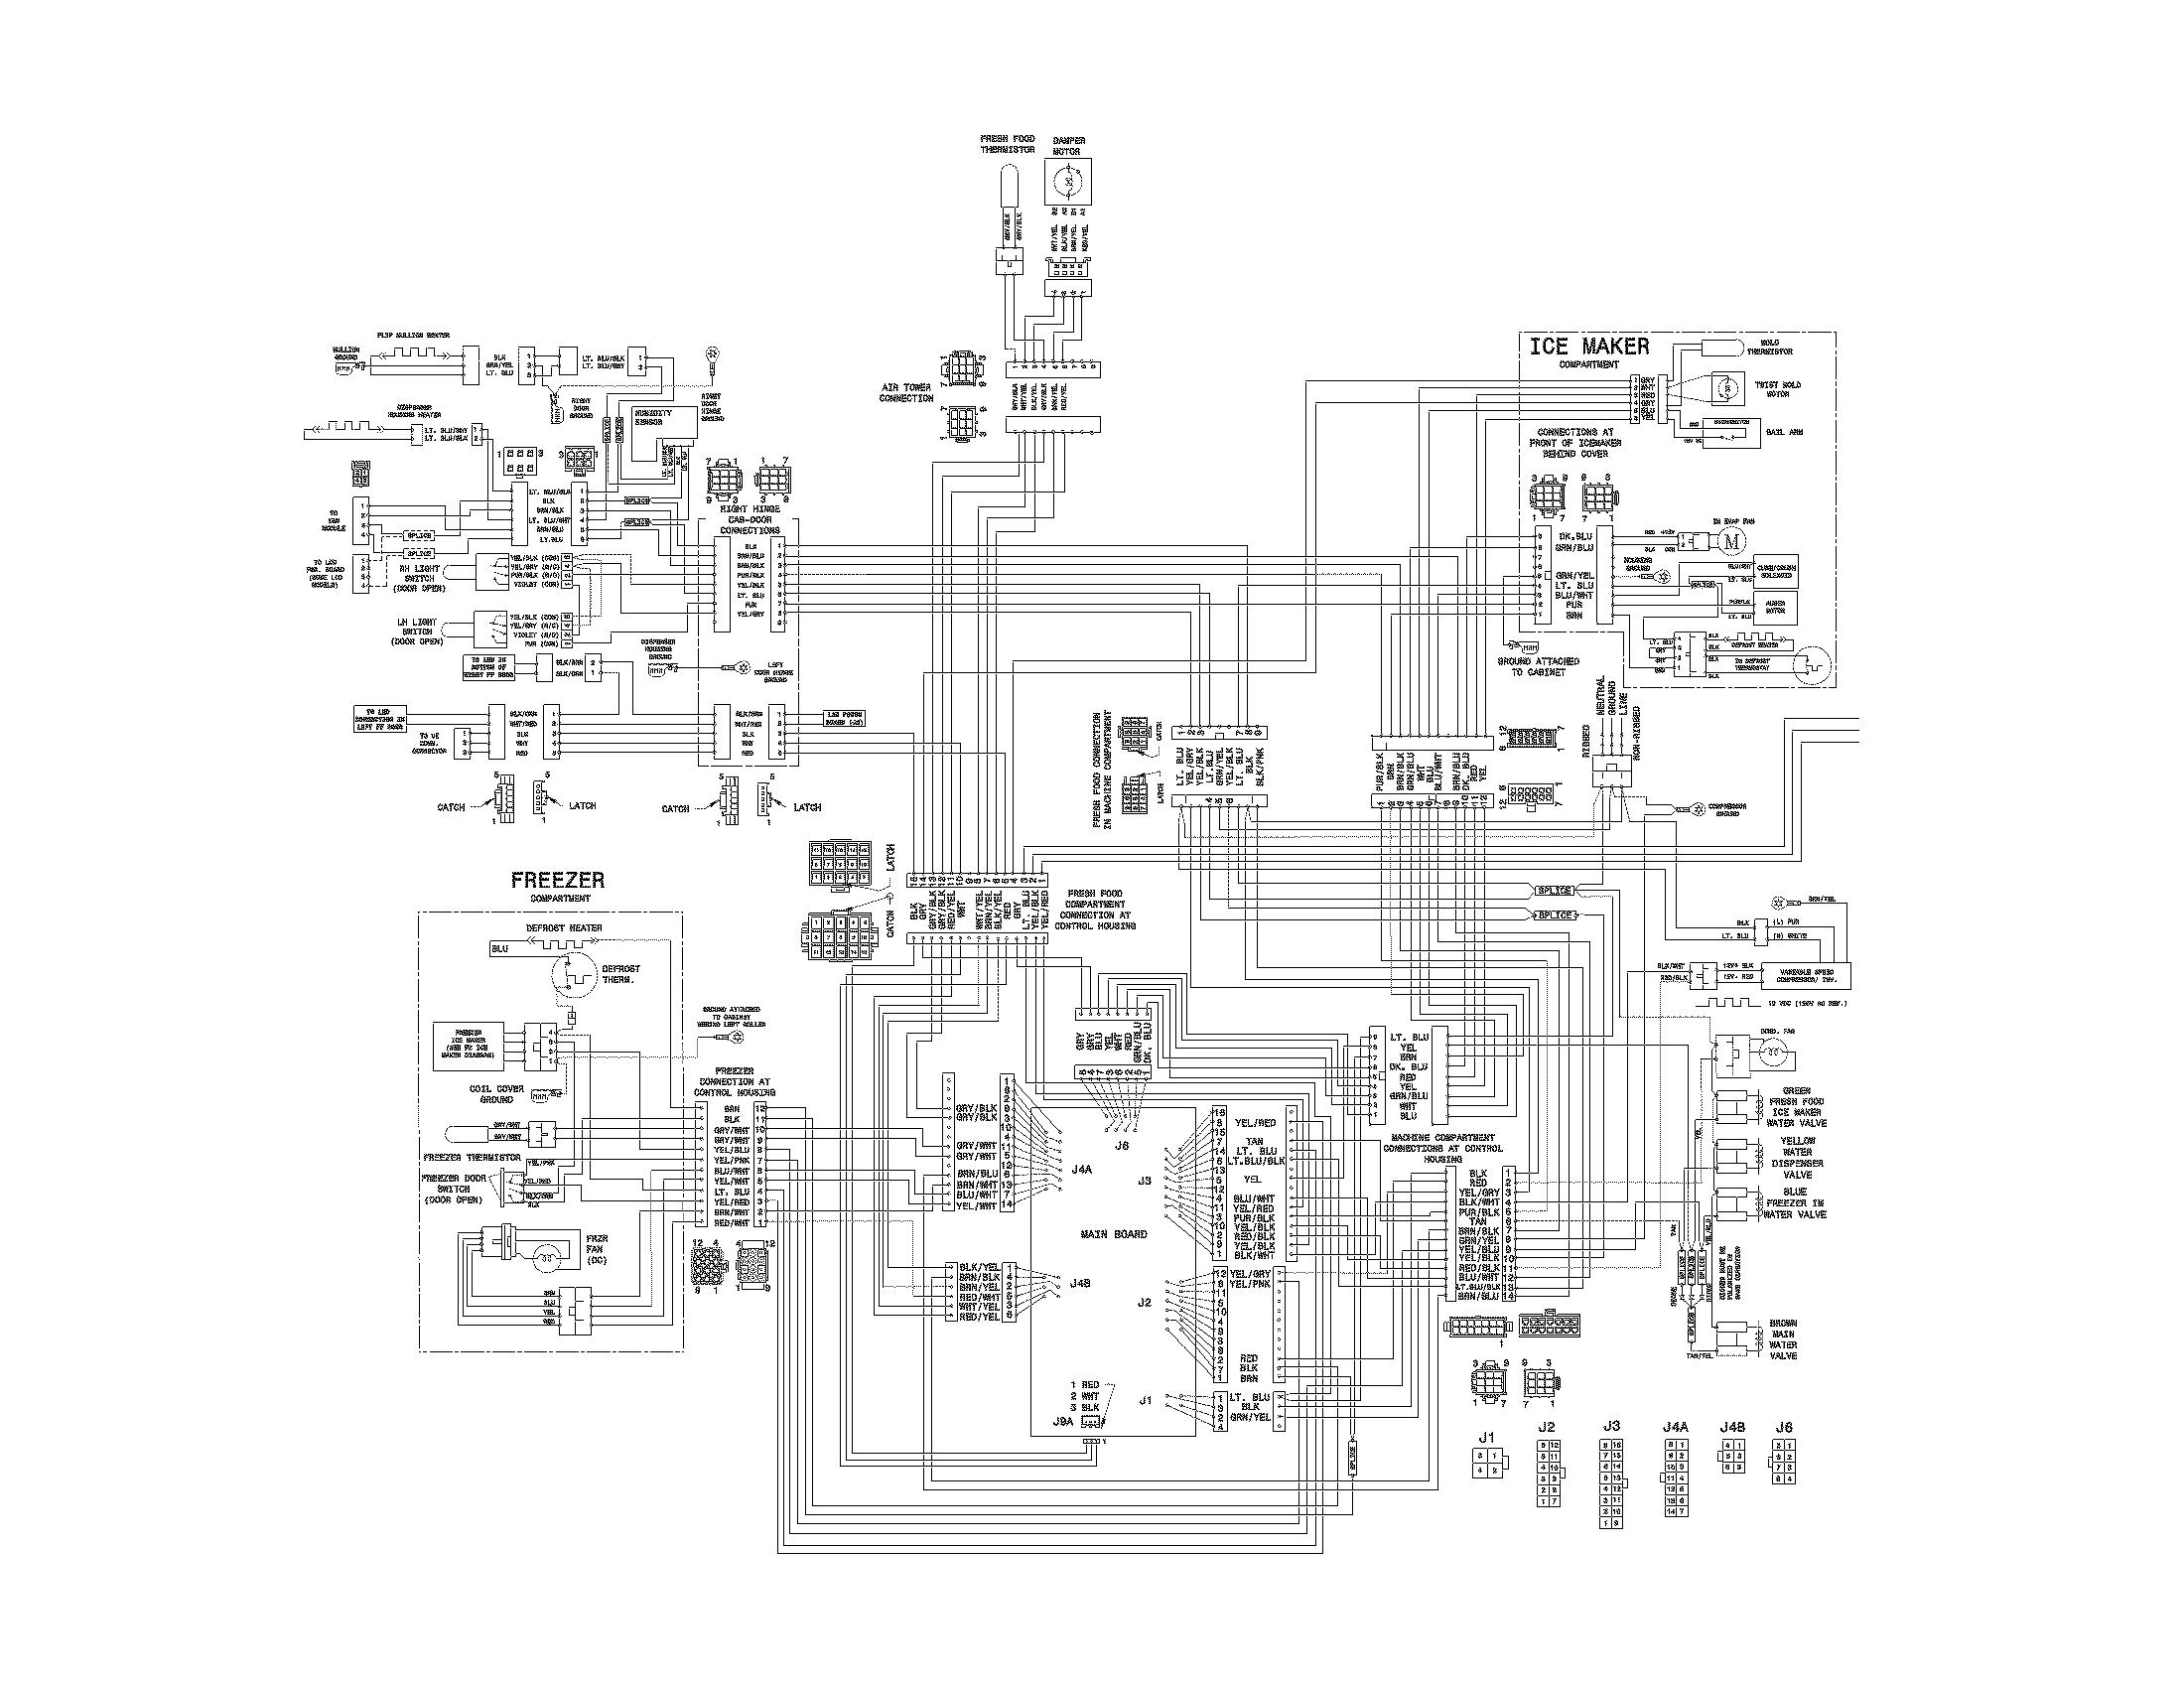 hight resolution of electrolux refrigerator parts model ei23bc35ks4 sears electrolux vacuum parts diagram electrolux double door refrigerator wiring diagram